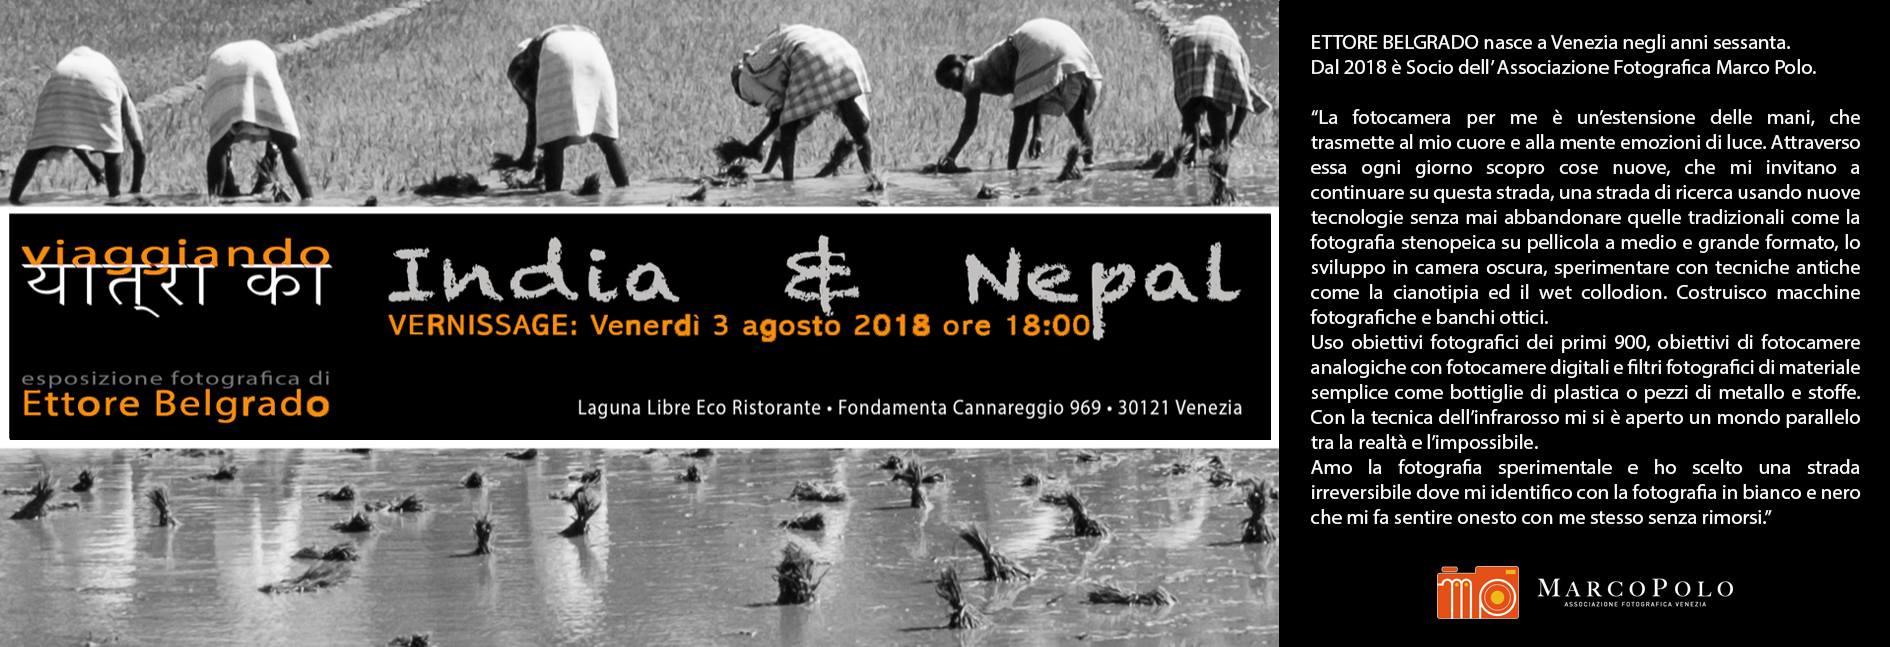 Ettore Belgrado - Viaggiando - India e Nepal